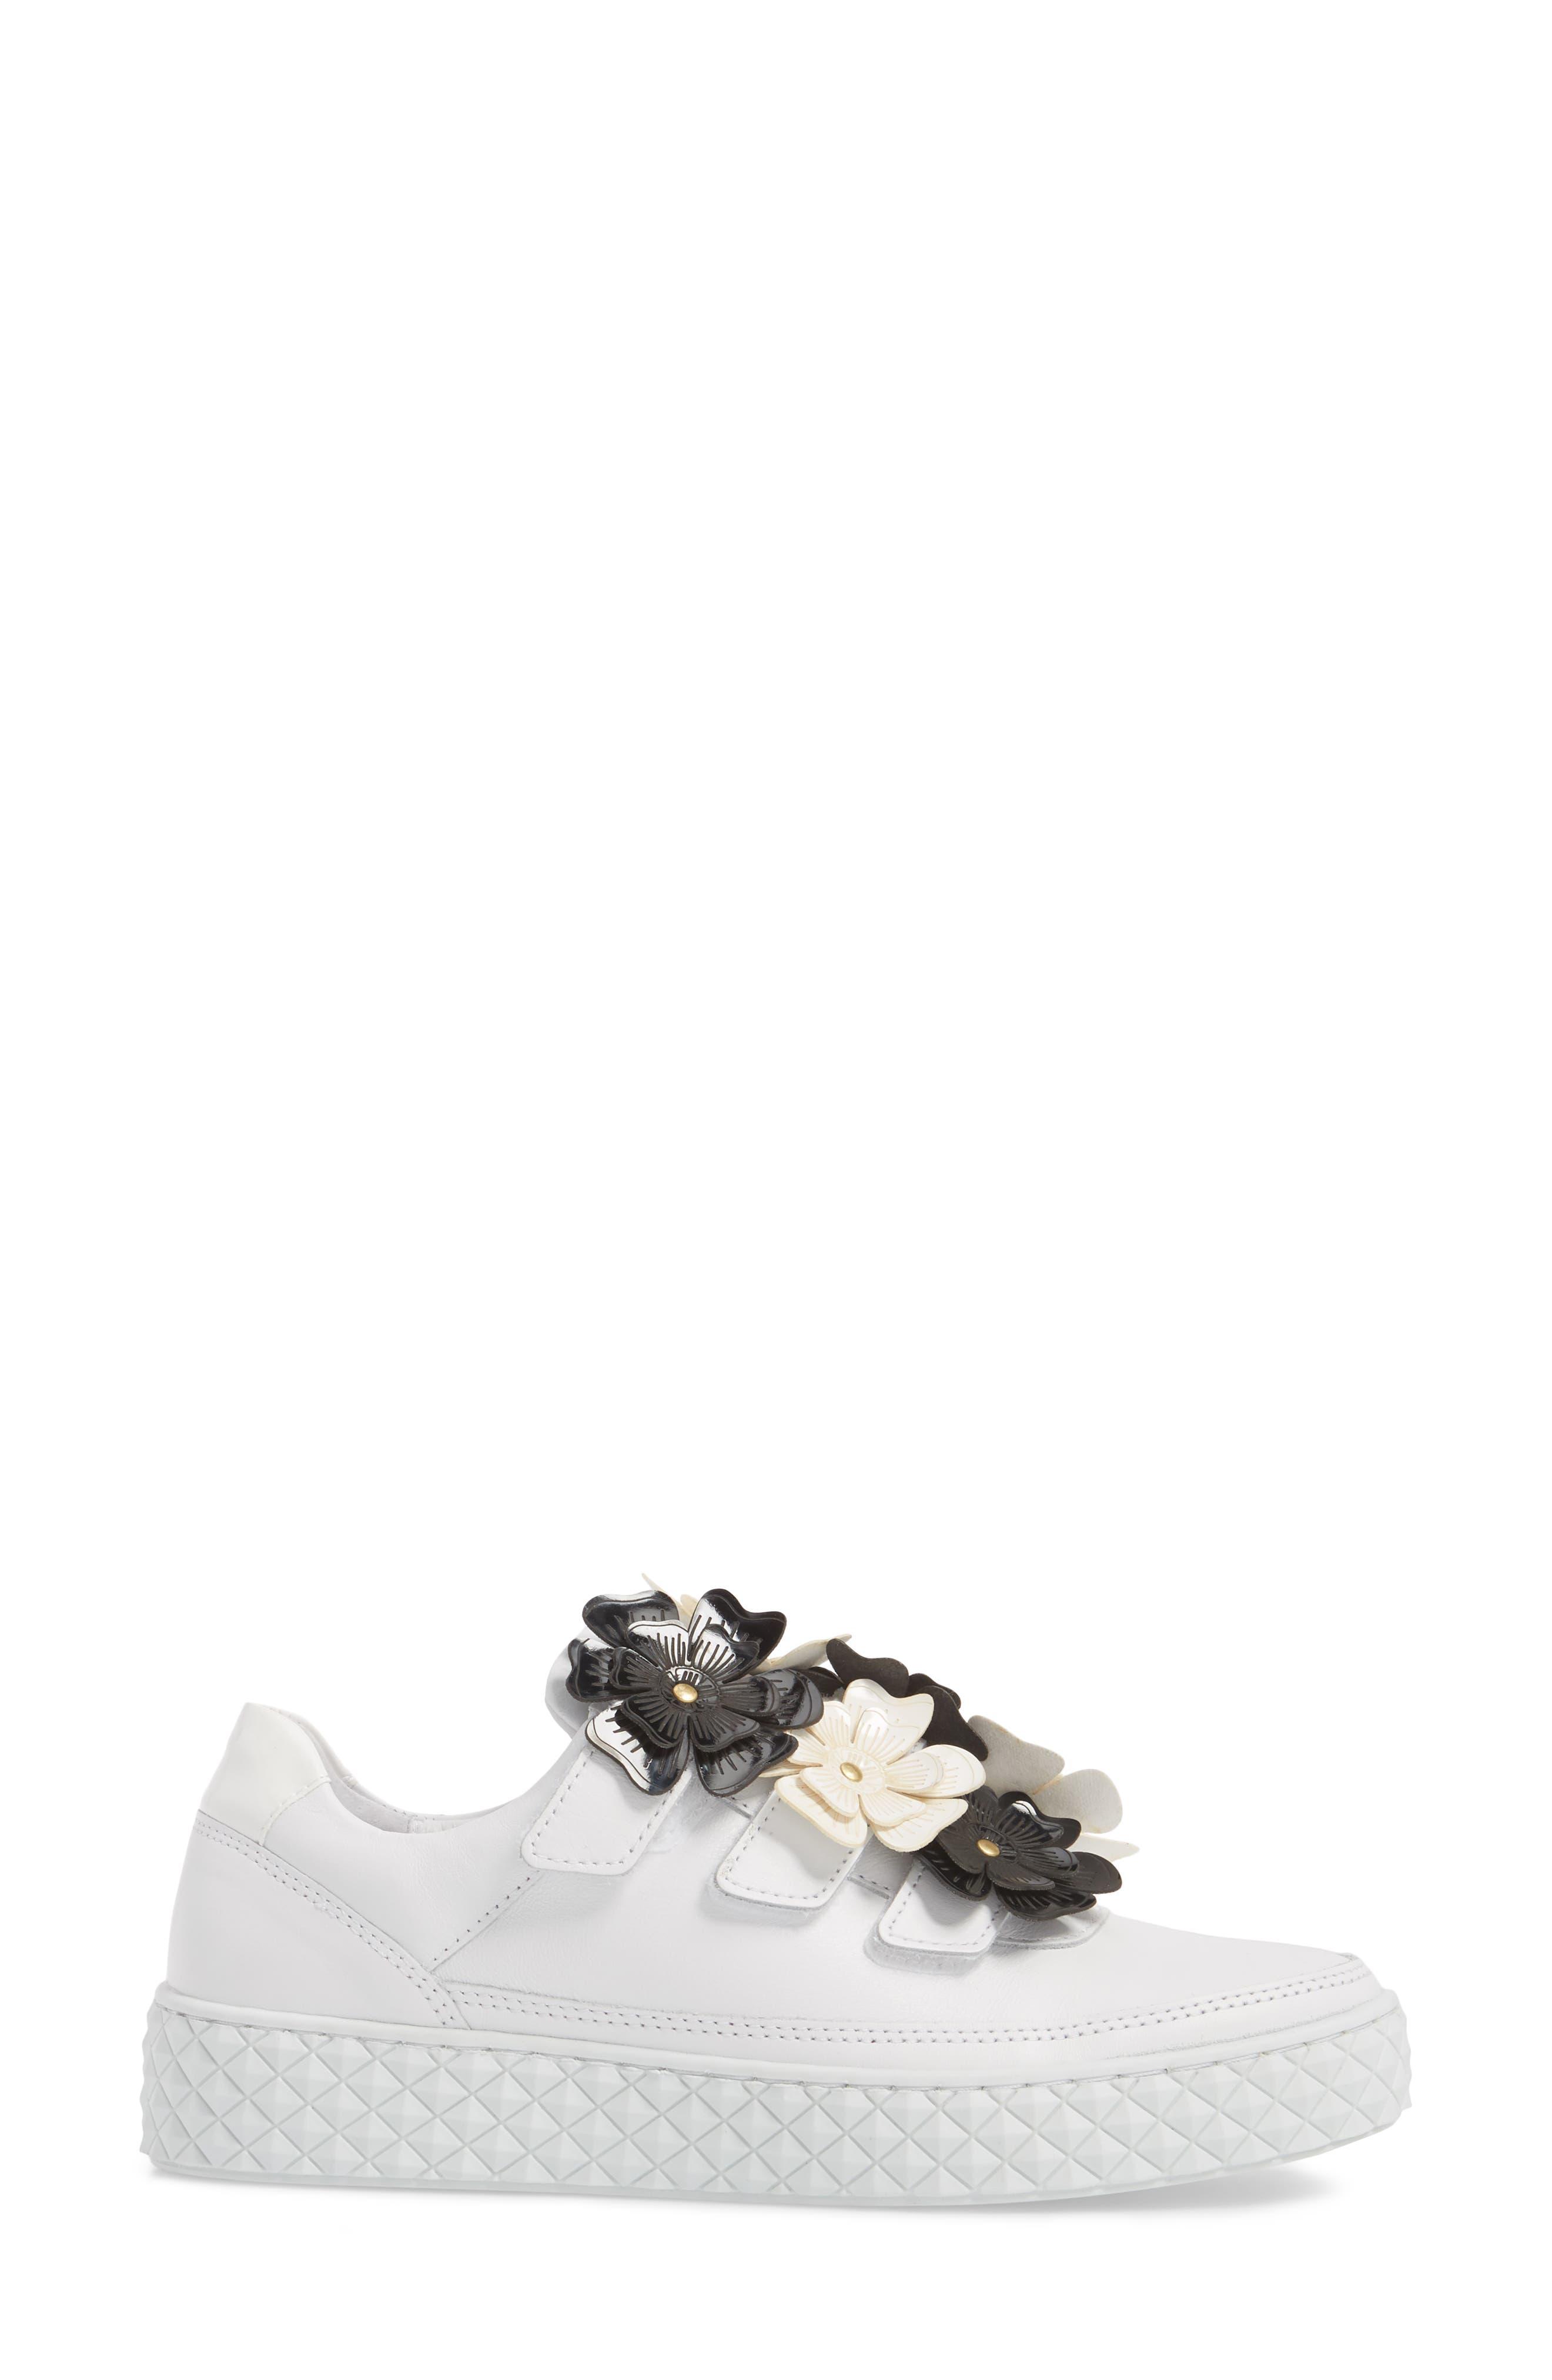 Hurou Embellished Sneaker,                             Alternate thumbnail 3, color,                             Optic White/ Black Leather